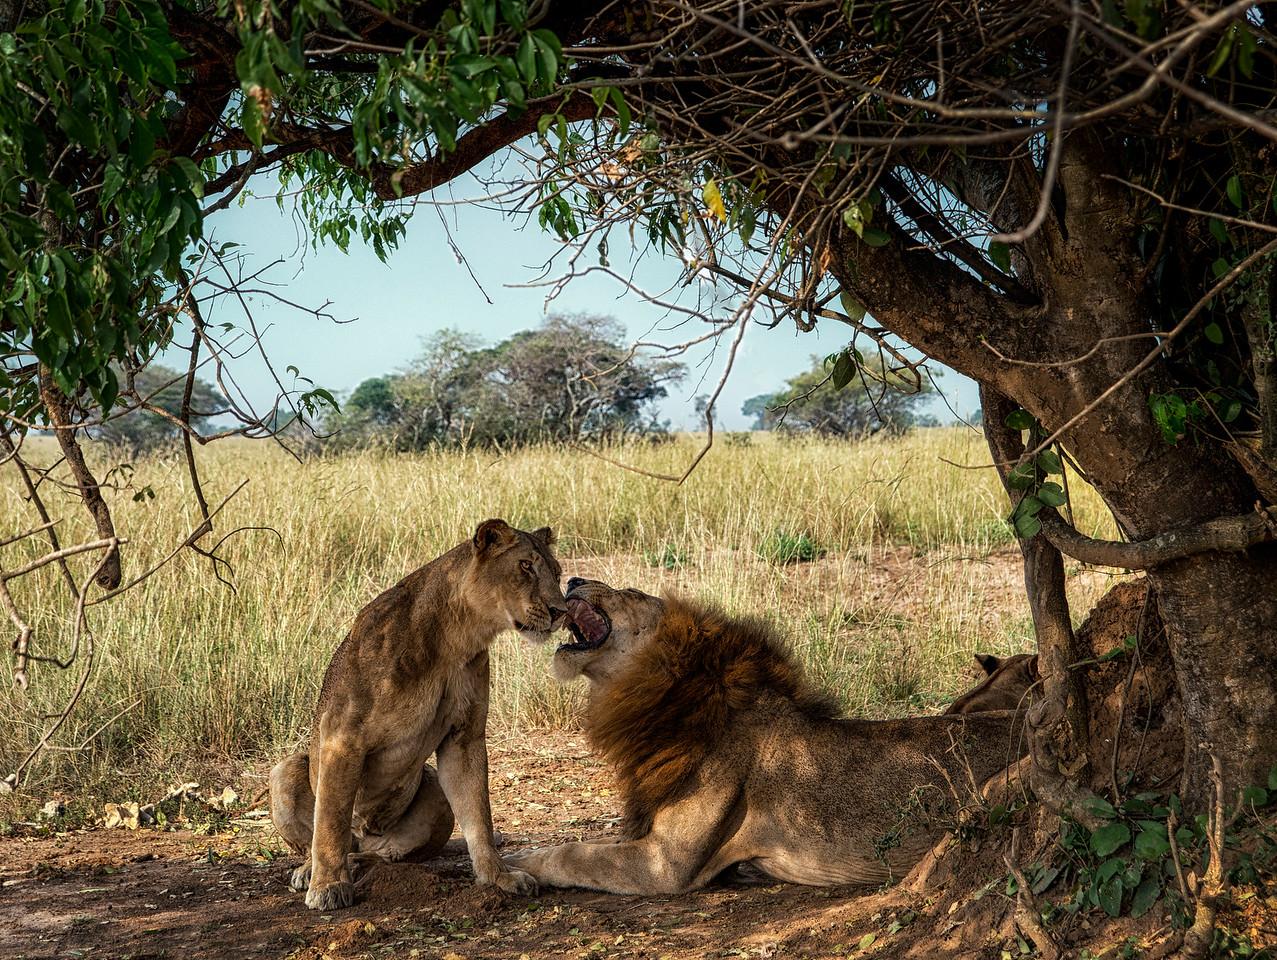 Pride of lions in Murchisons national Park, Uganda,2016.